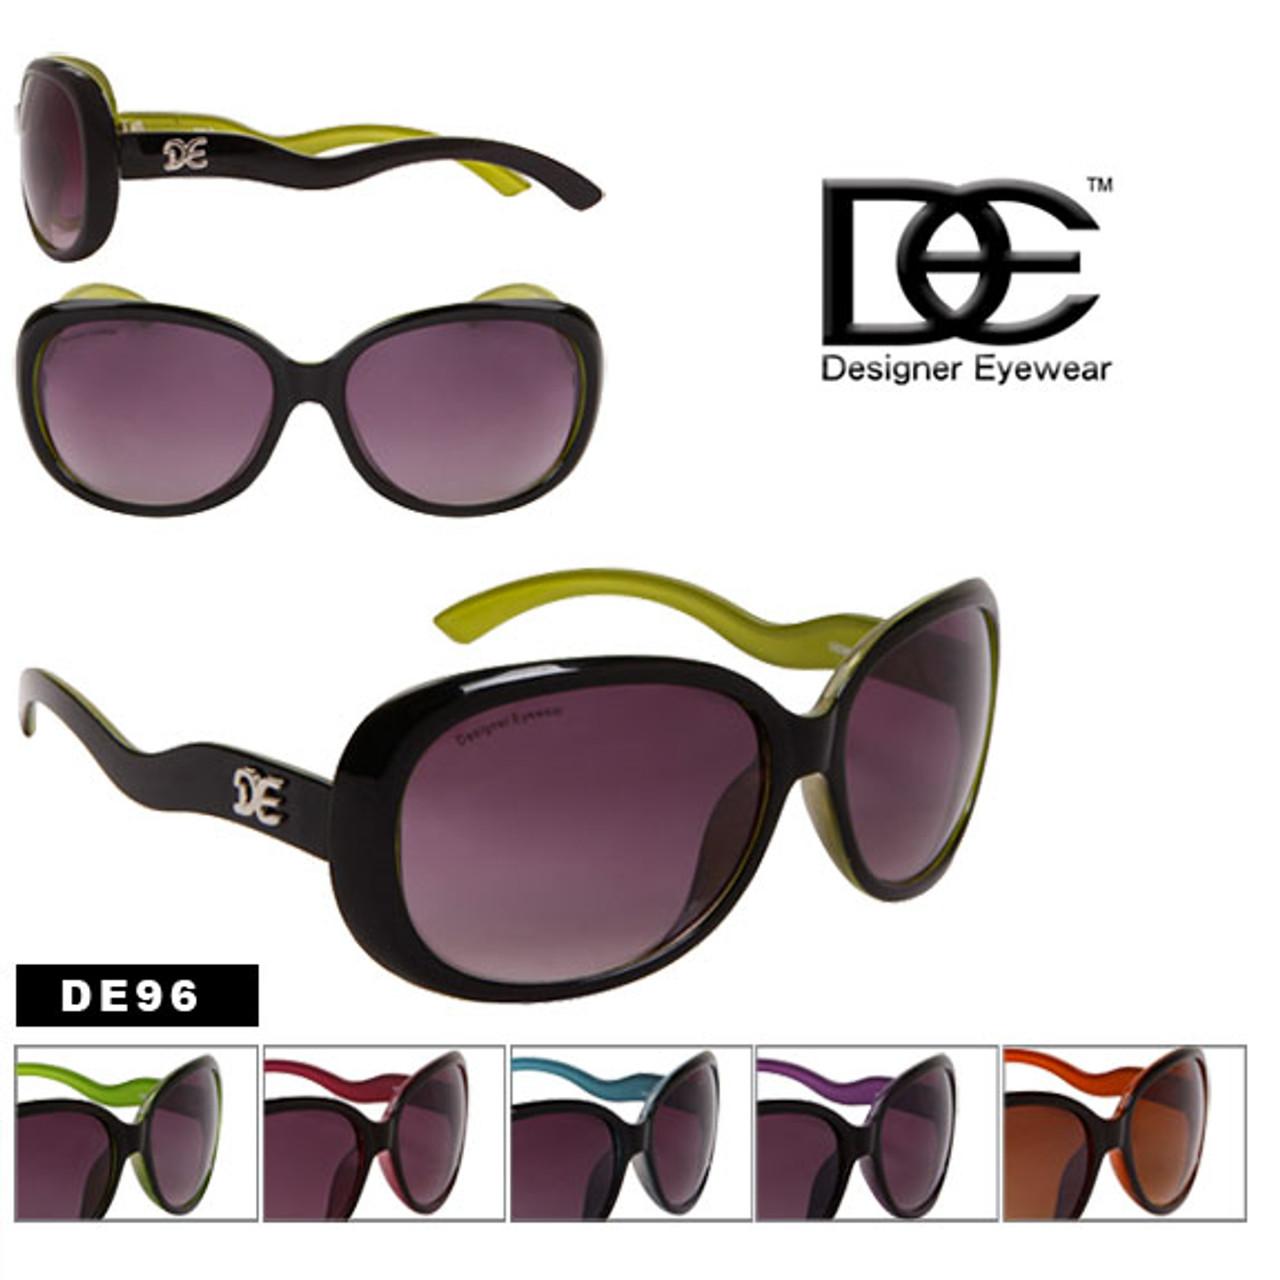 Wholesale DE Designer Eyewear Sunglasses